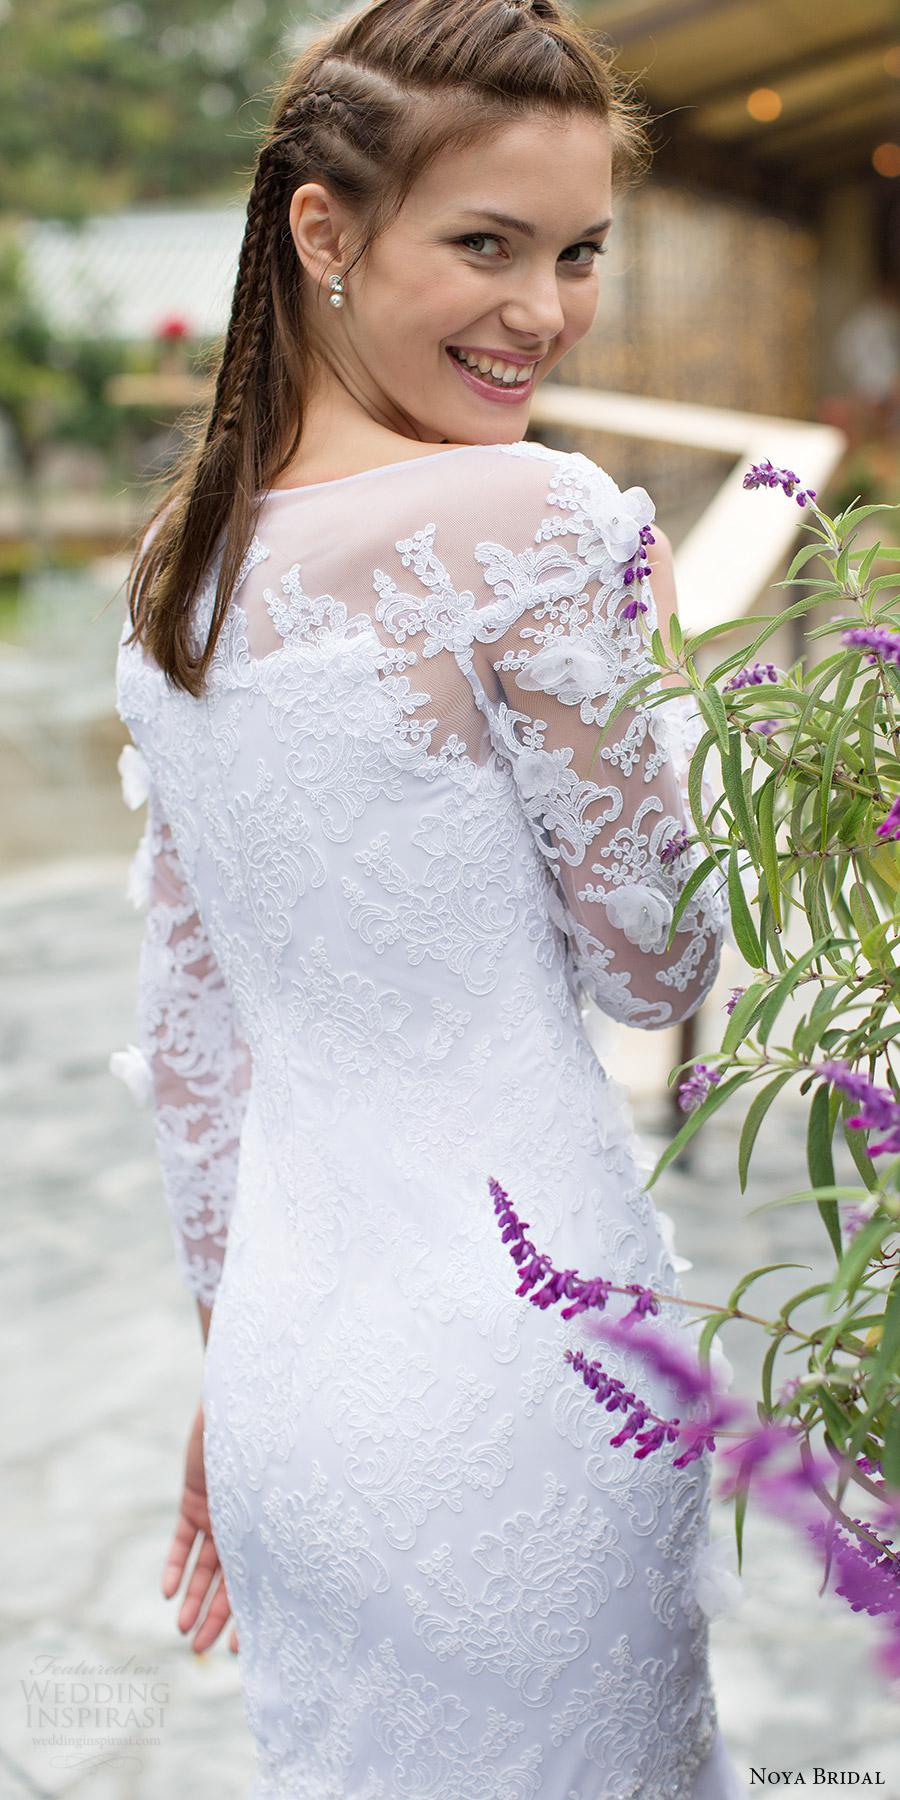 noya bridal 2016 long sleeves sweethart illusion bateau neck fit flare wedding dress (1204) zbv elegant romantic